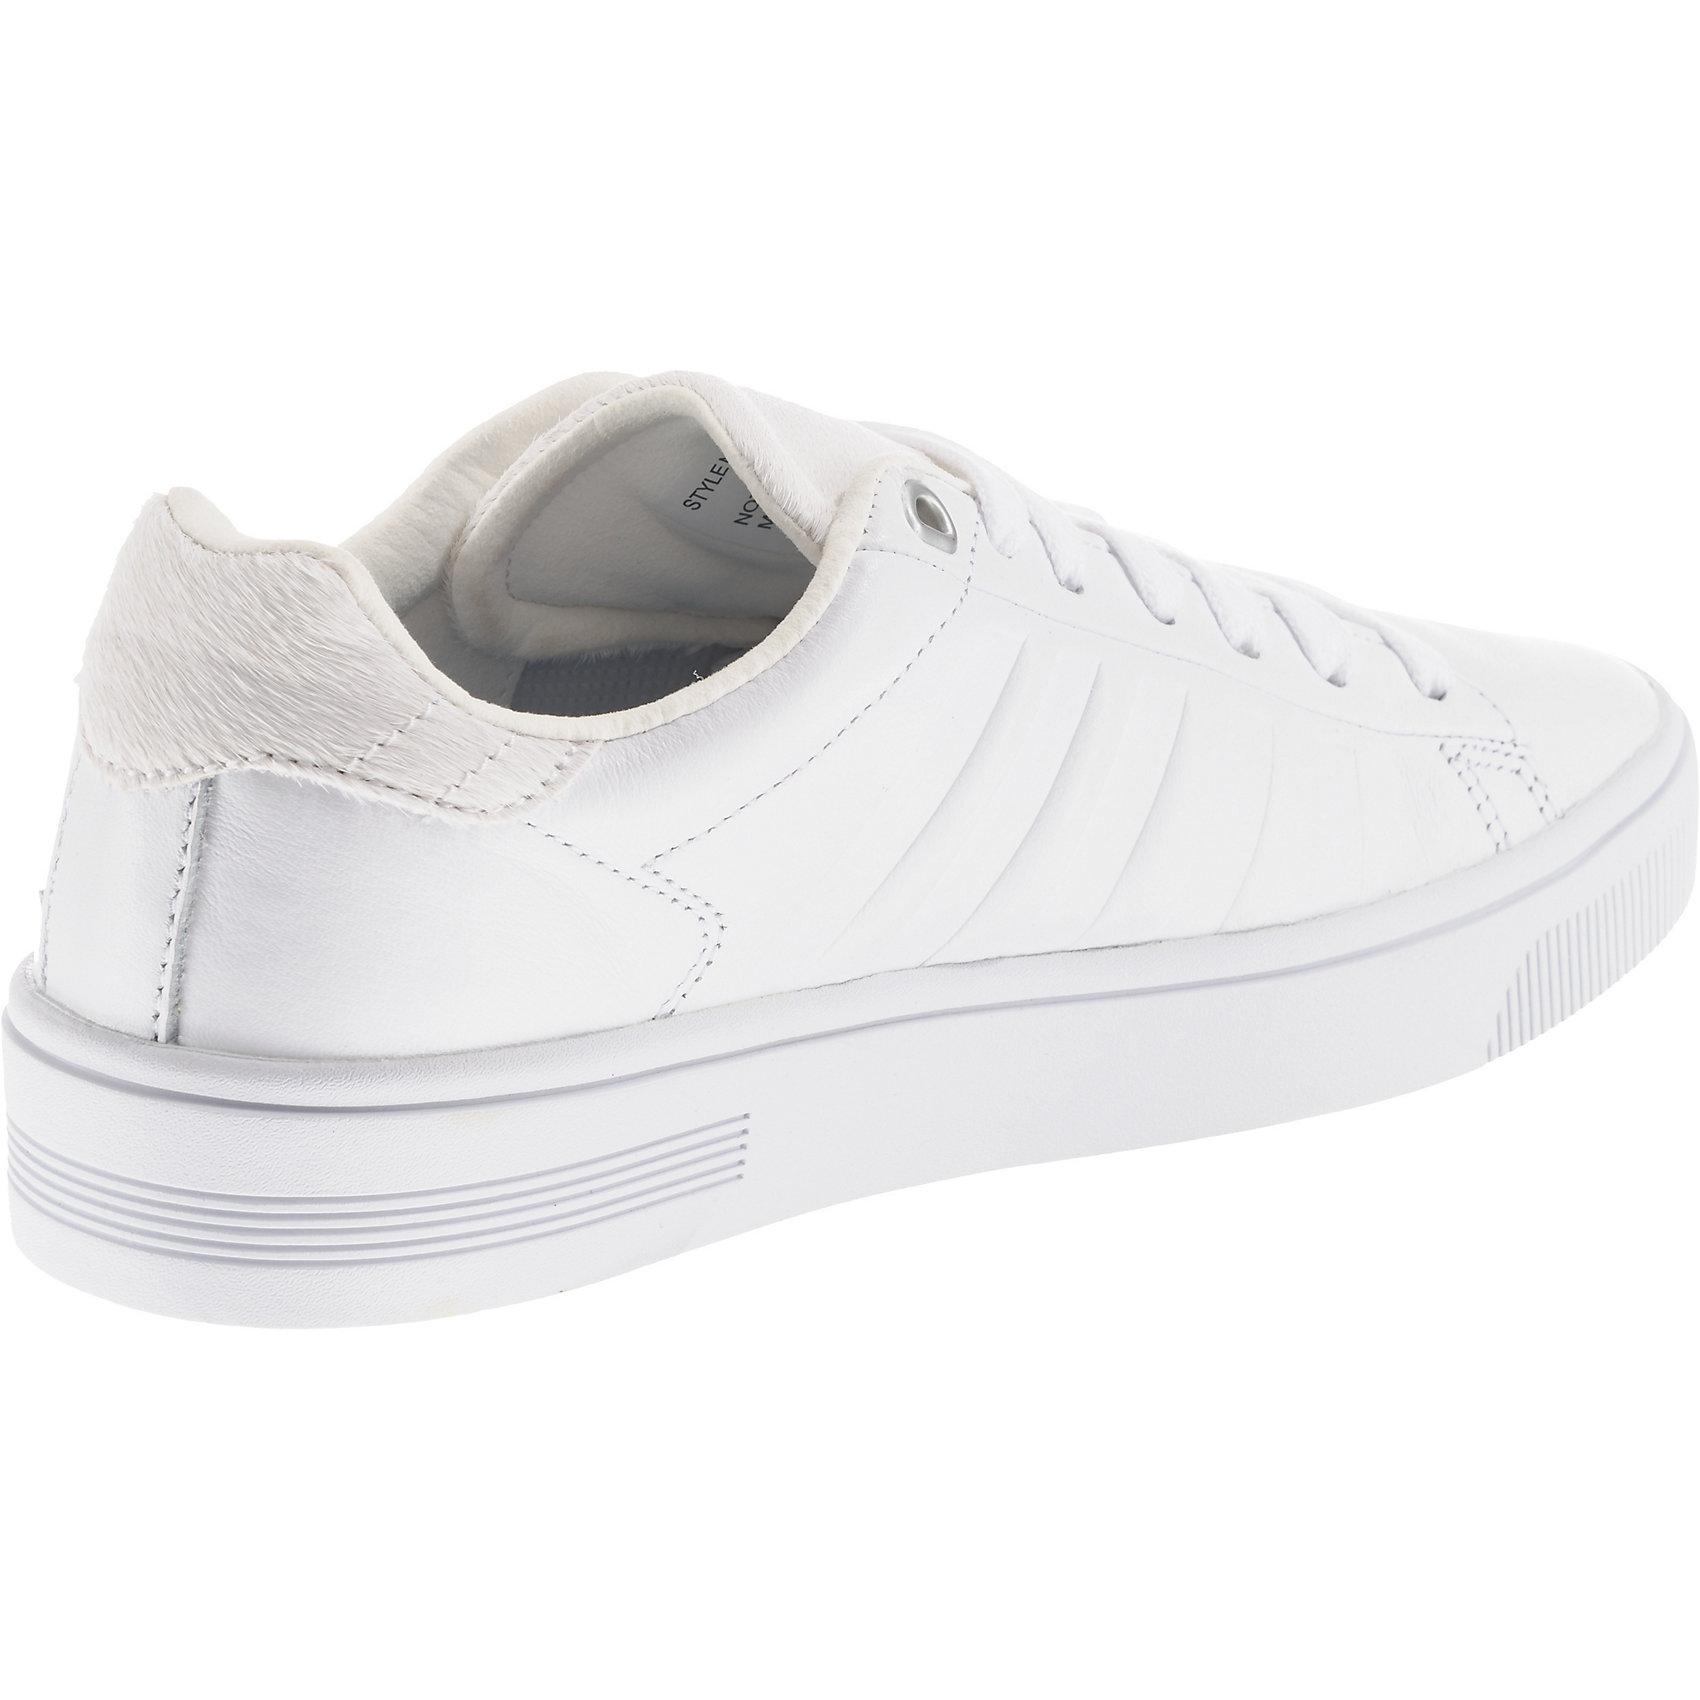 Neu Court K-SWISS Court Neu Frasco Sneakers Niedrig 8533211 für Damen weiß b5e2b1